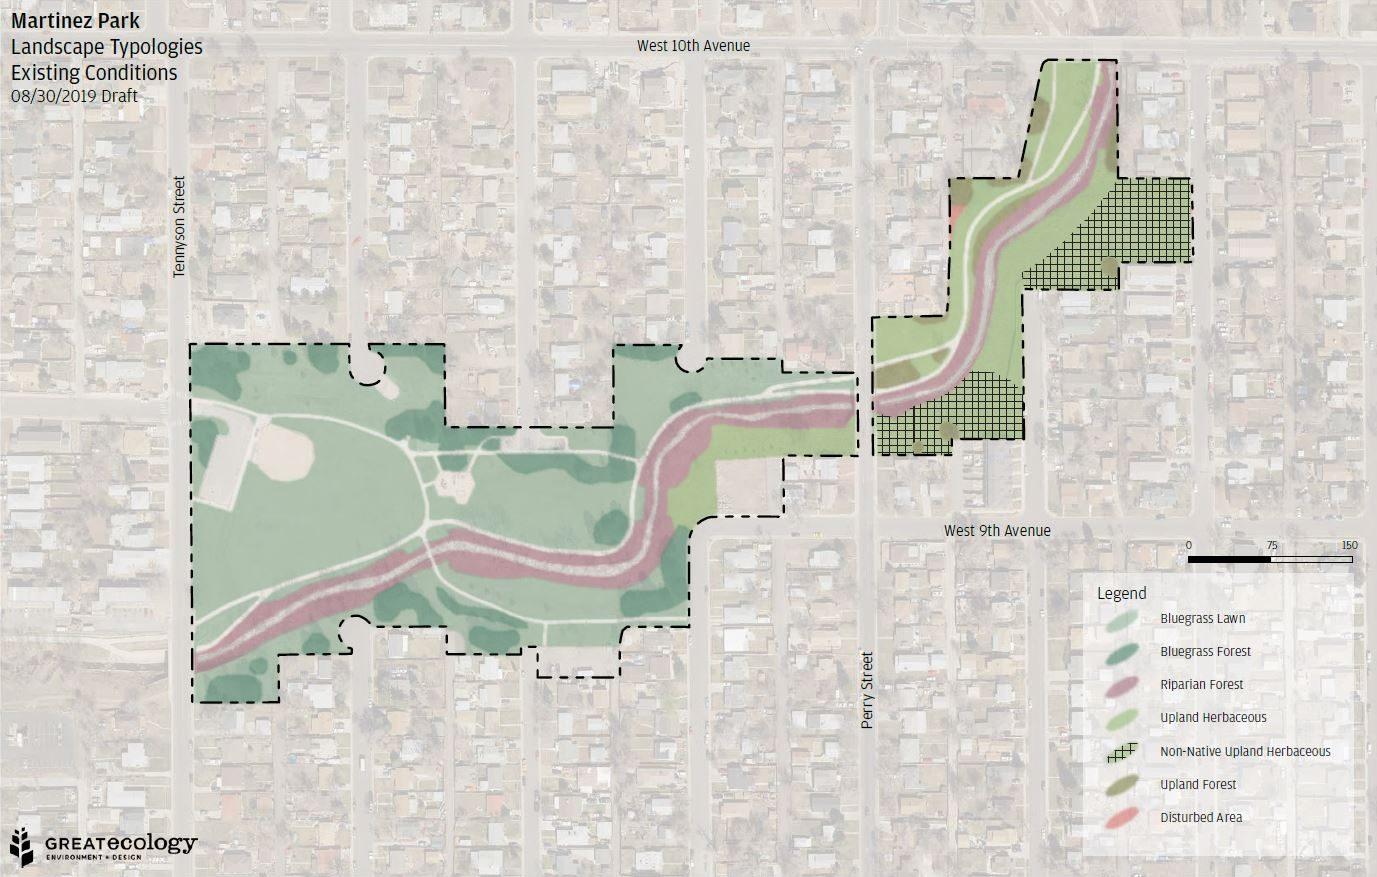 Joseph P. Martinez Park Master Plan